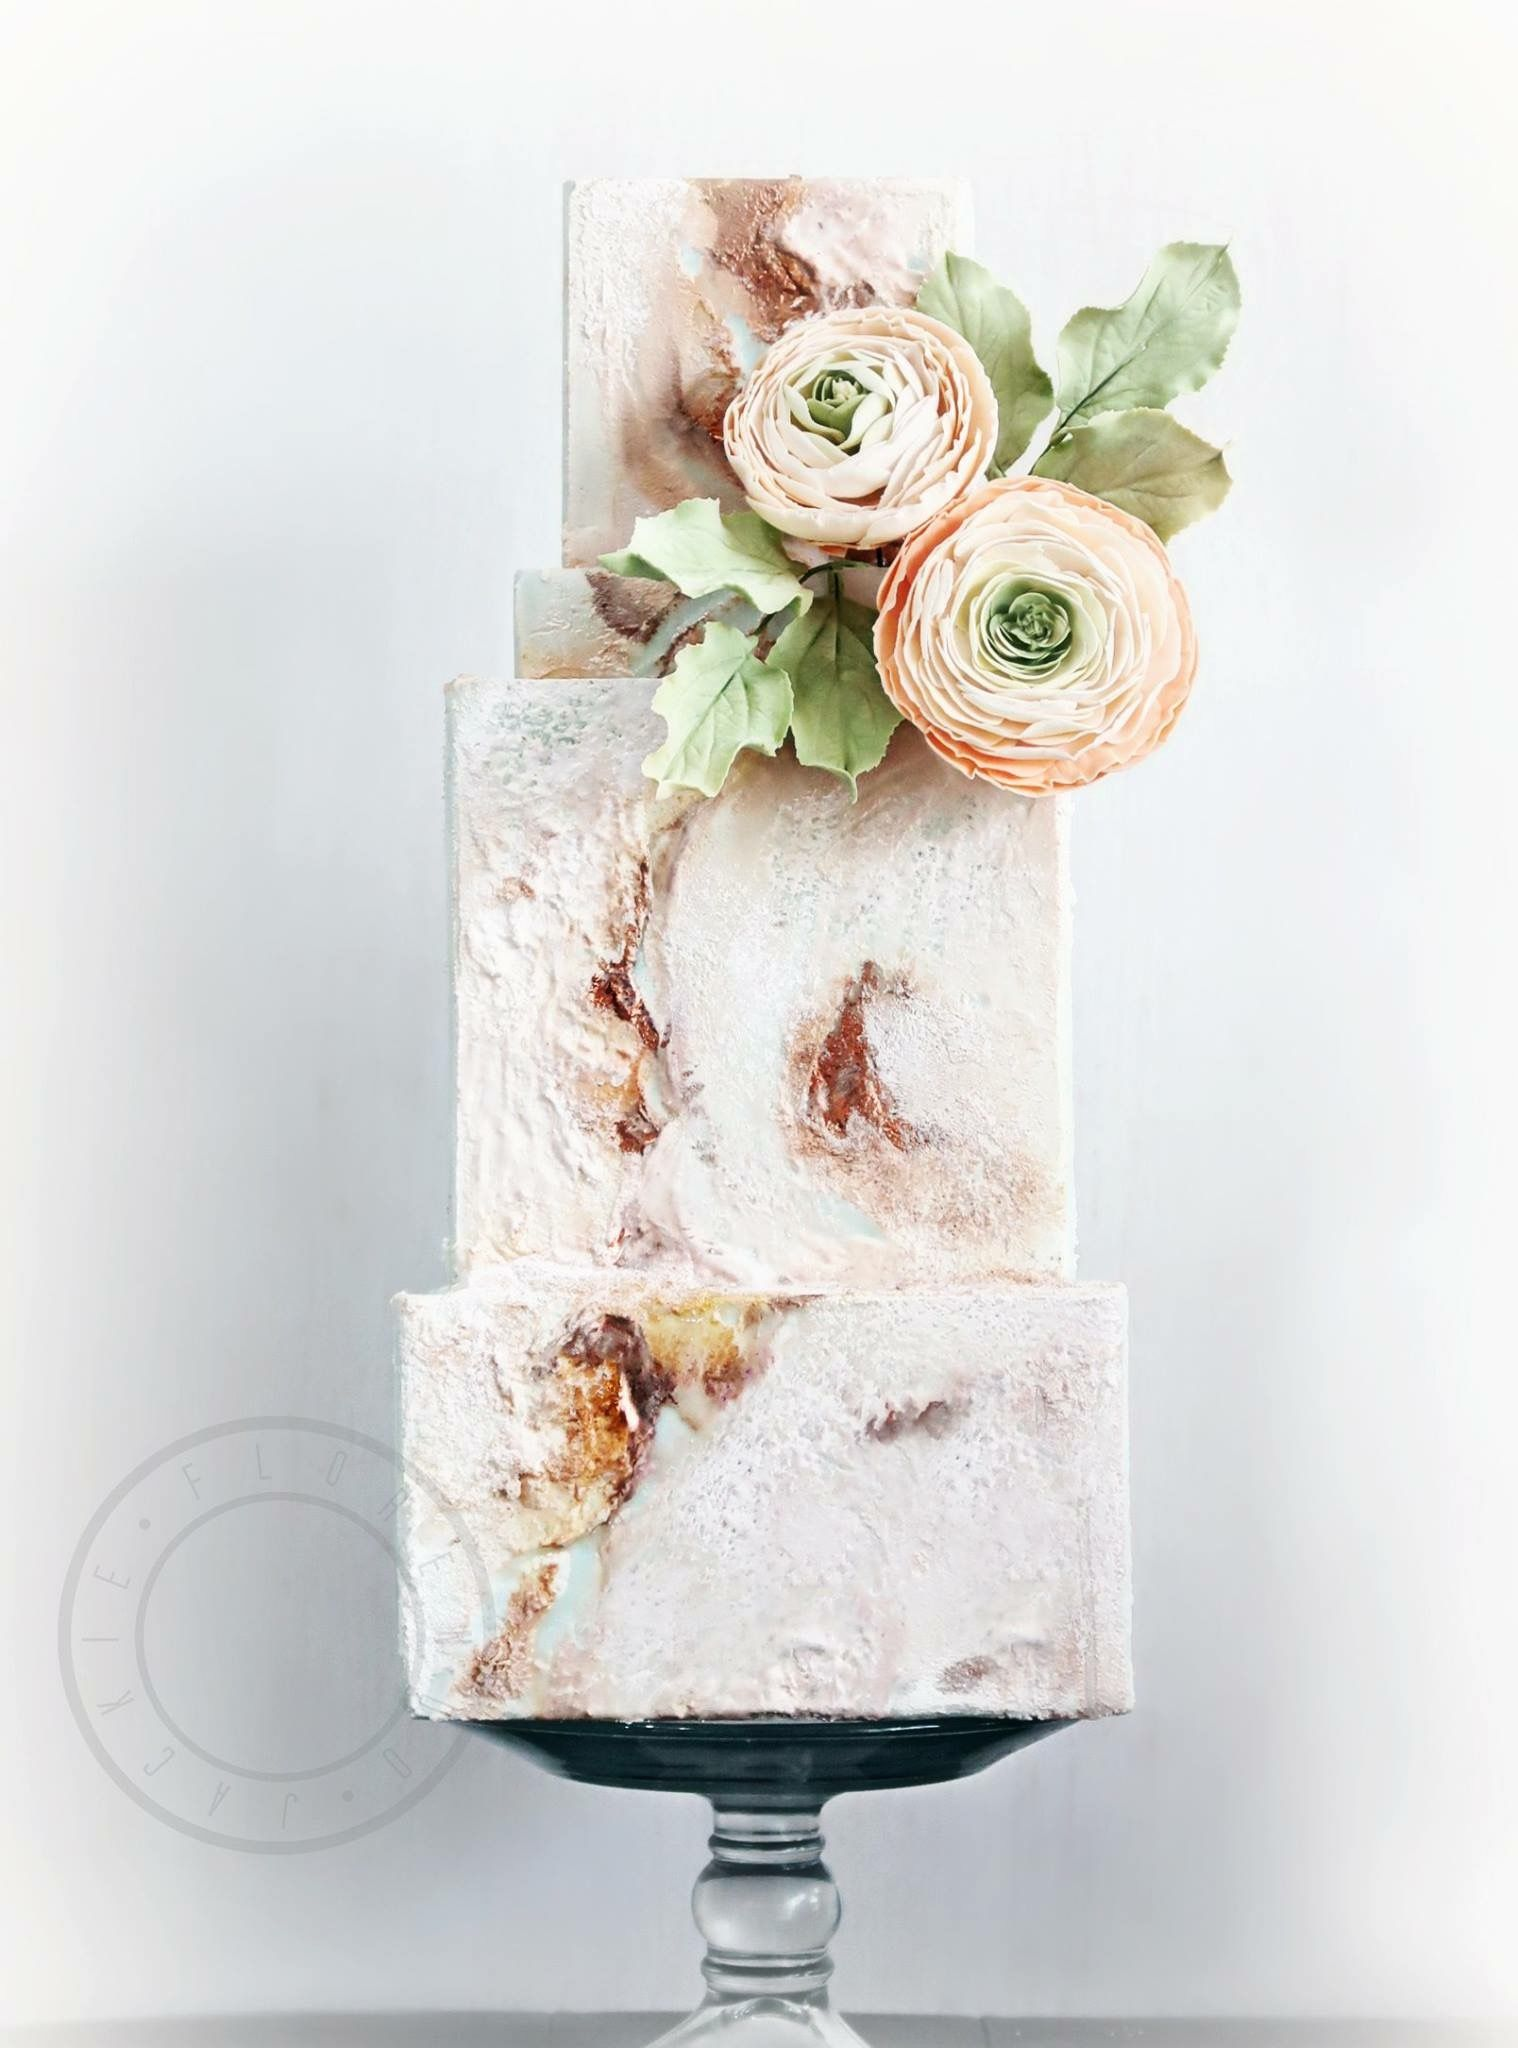 Honed Marble Fondant With Gumpaste Flowers Ranunculus Modern And Elegant Wedding Cakes B Wedding Cake Marble Wedding Cake Pictures Wedding Cakes With Flowers